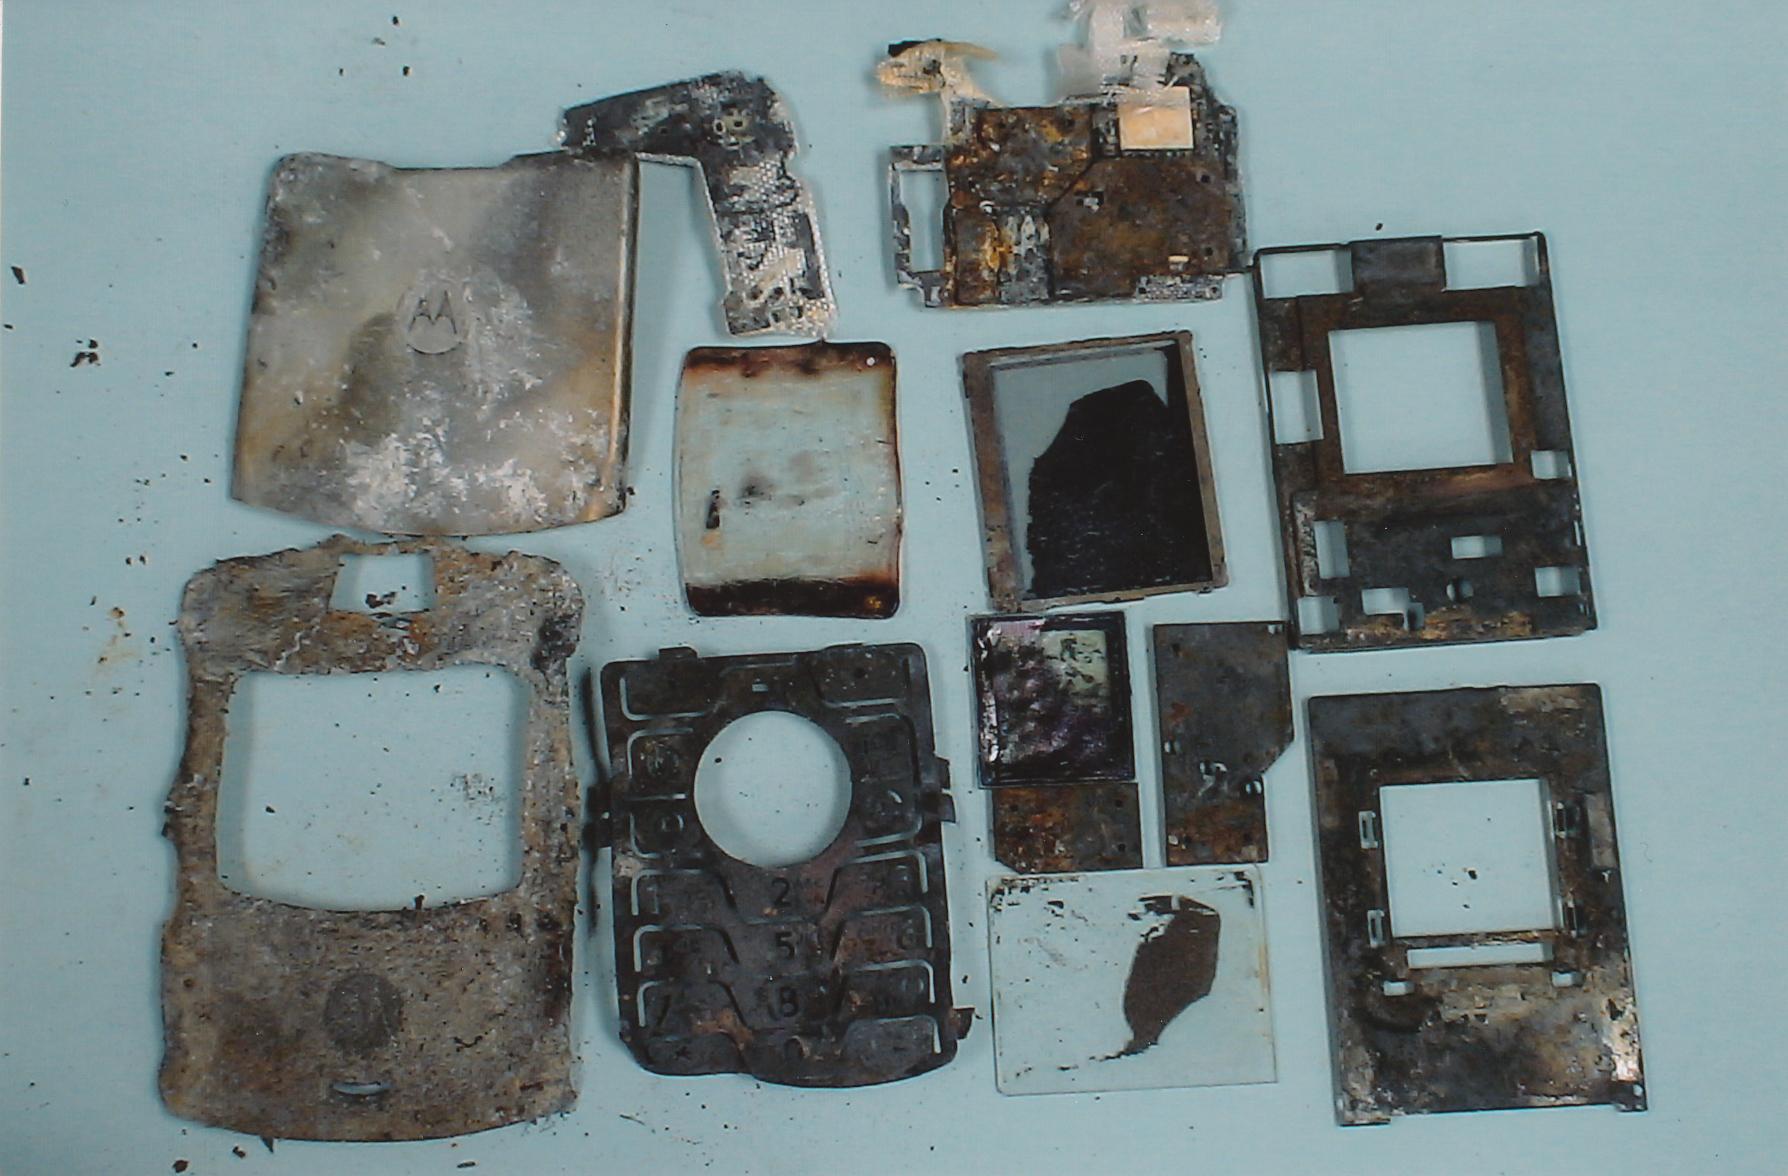 exhibit-412-burnt-cell-phone-pieces